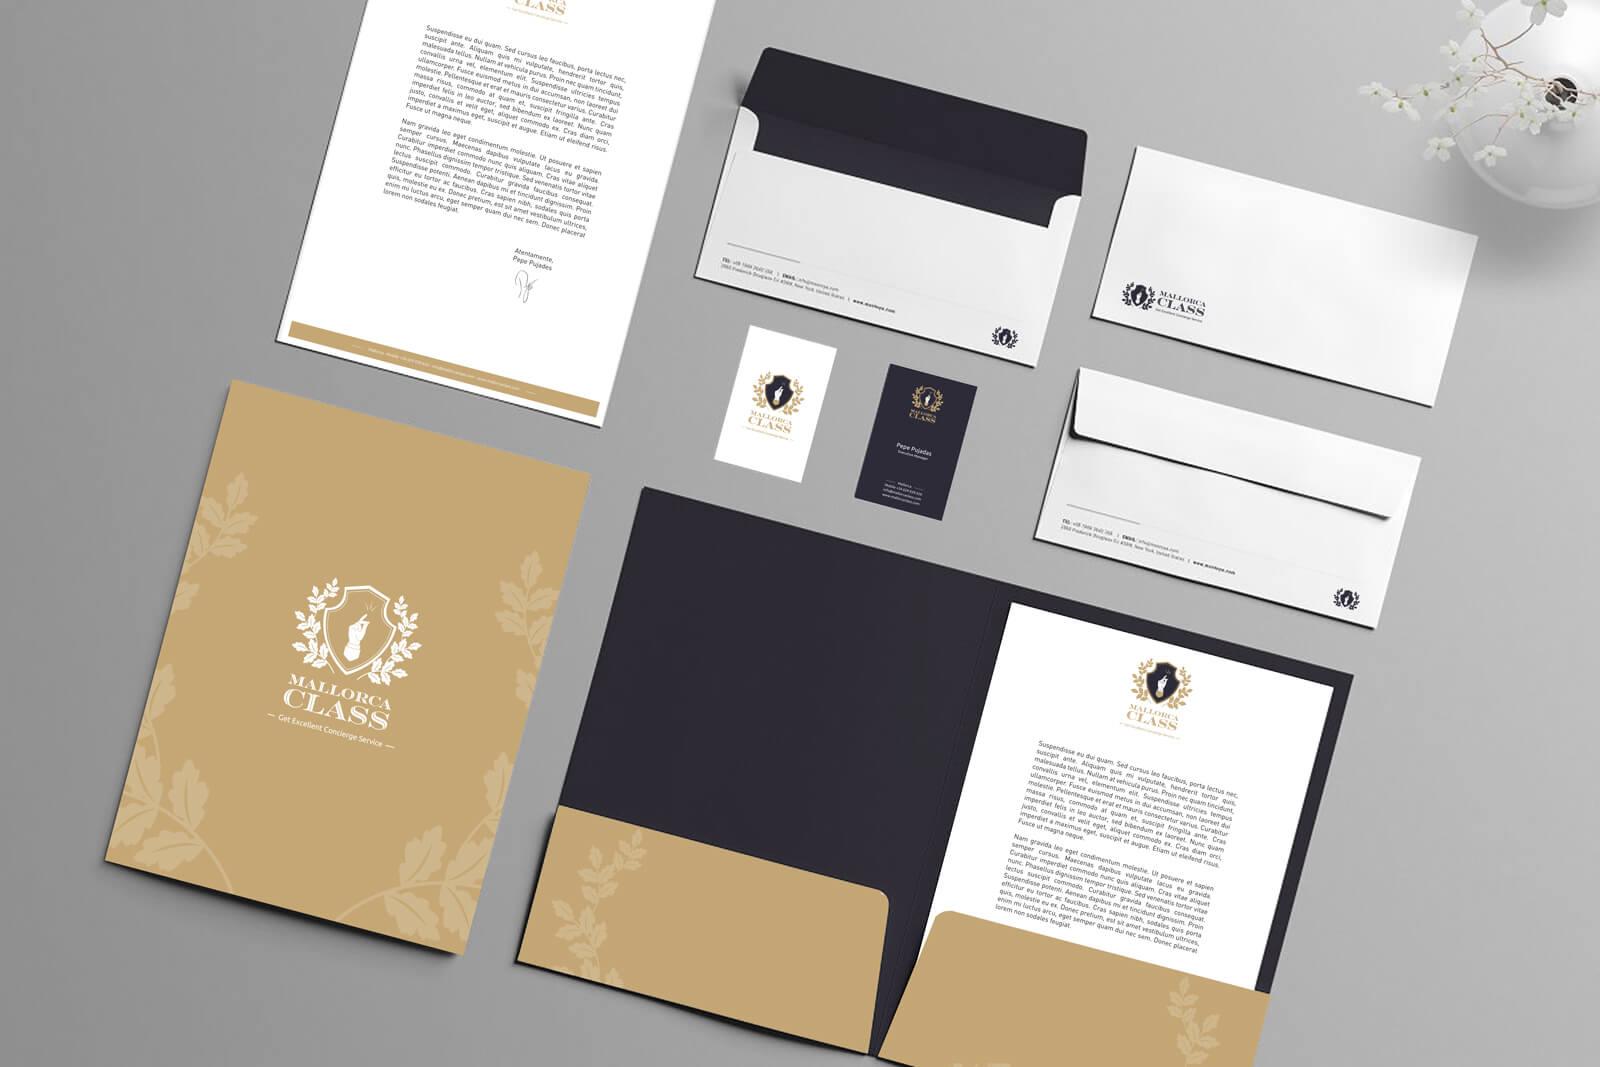 mallorca-class-brand-identity